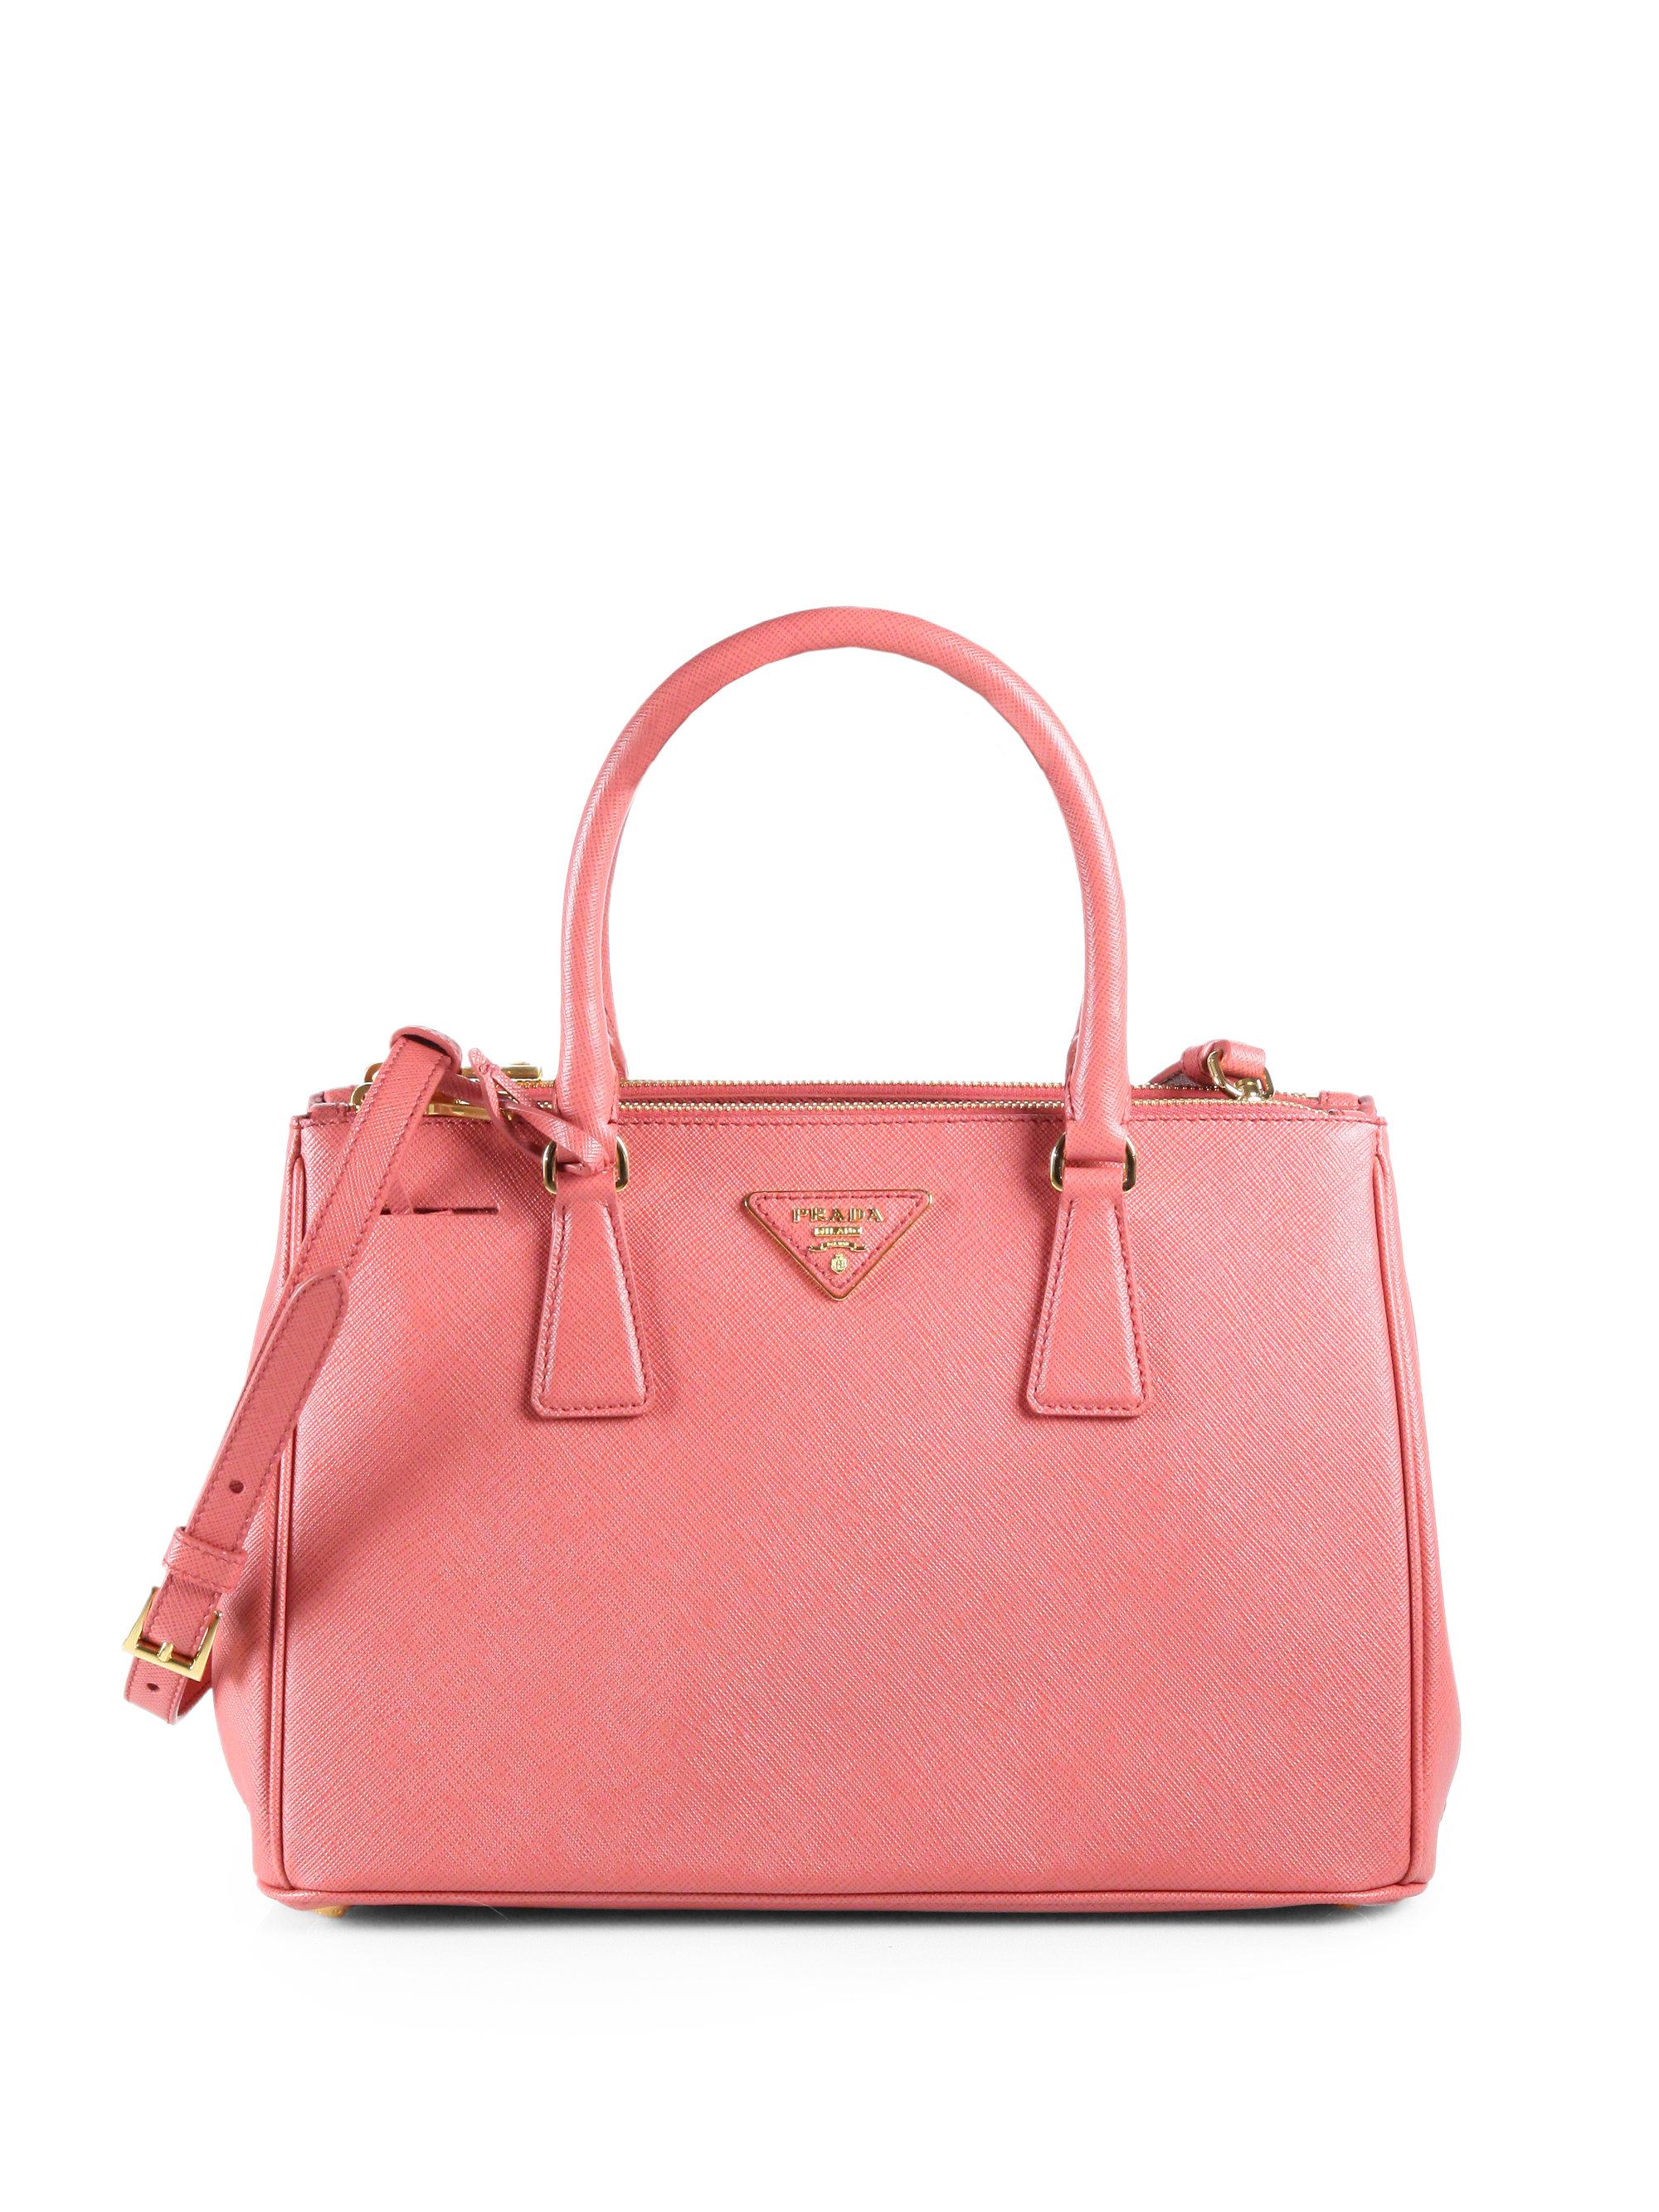 lyst prada saffiano lux small tote bag in pink